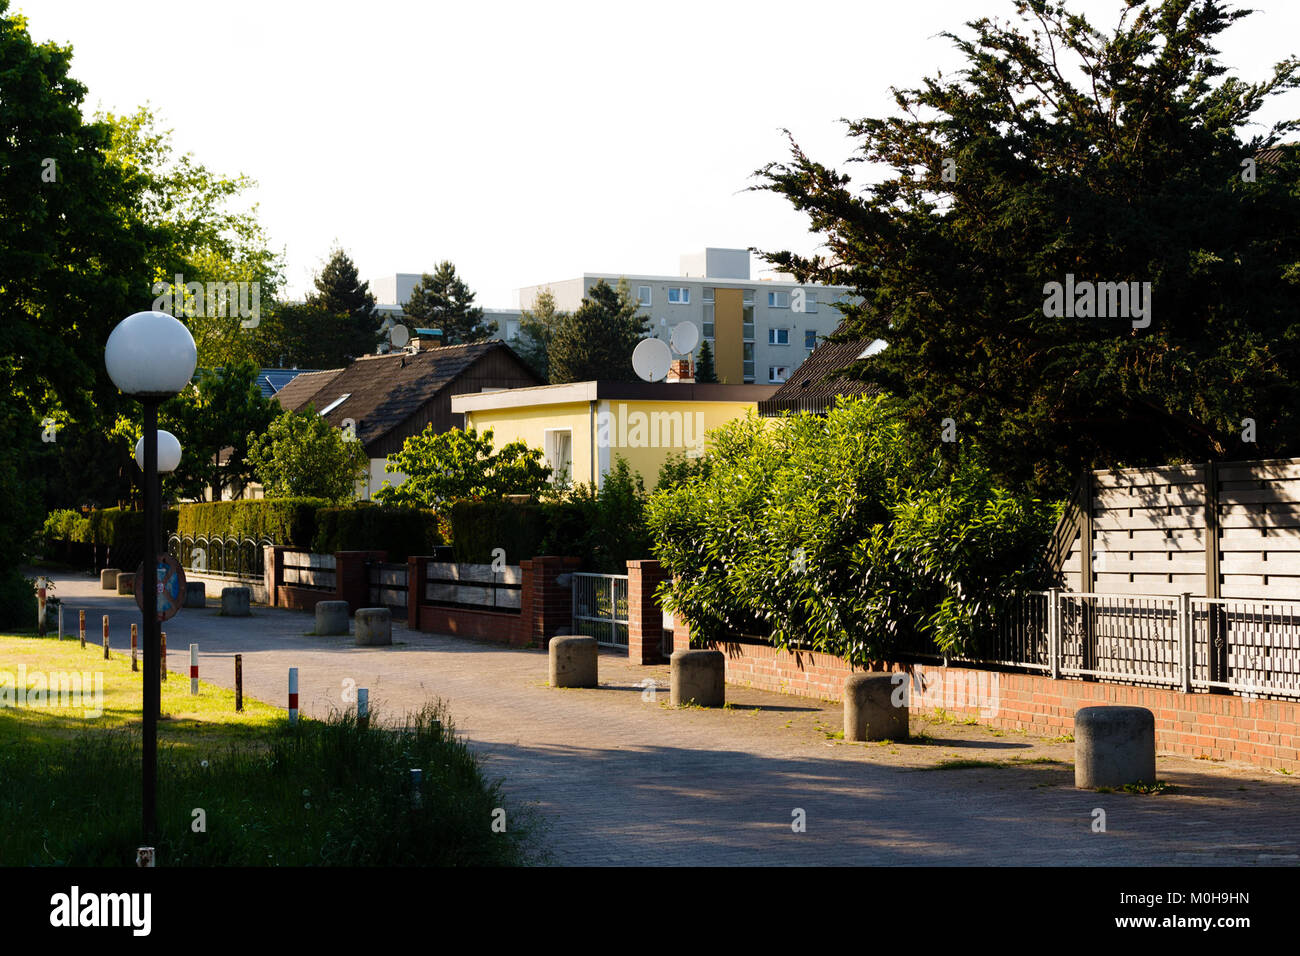 Buckower Chaussee, Fußweg 20140520 15. Stockbild